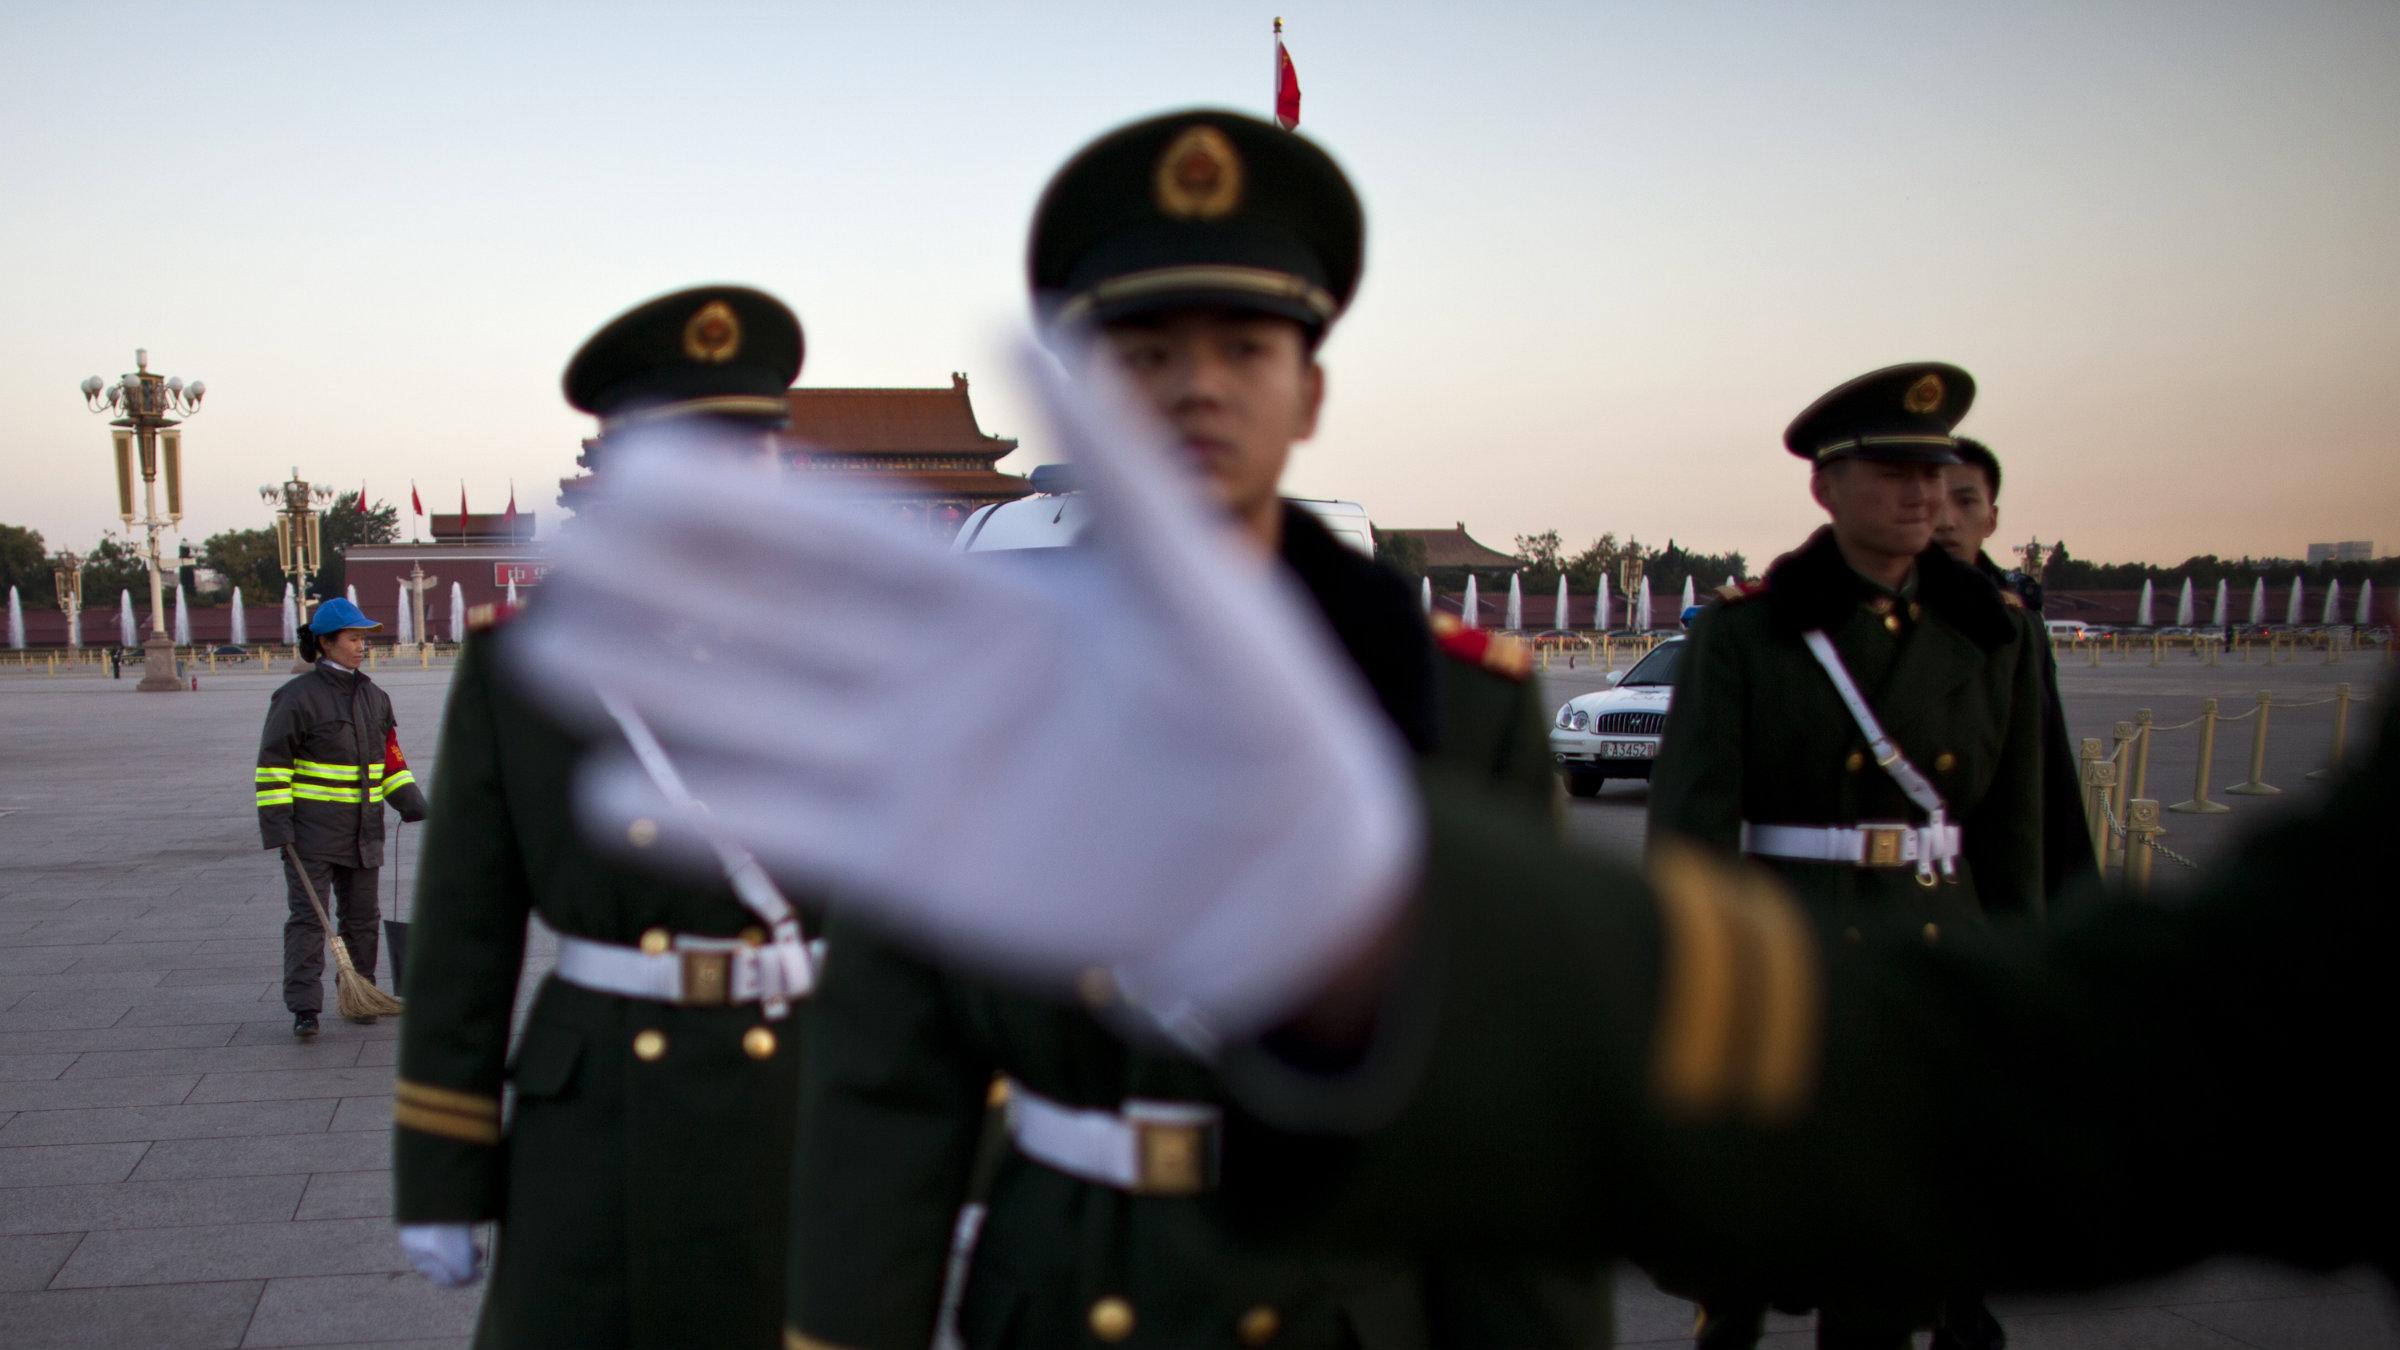 MILITARY AP Photo Alexander F. Yuan